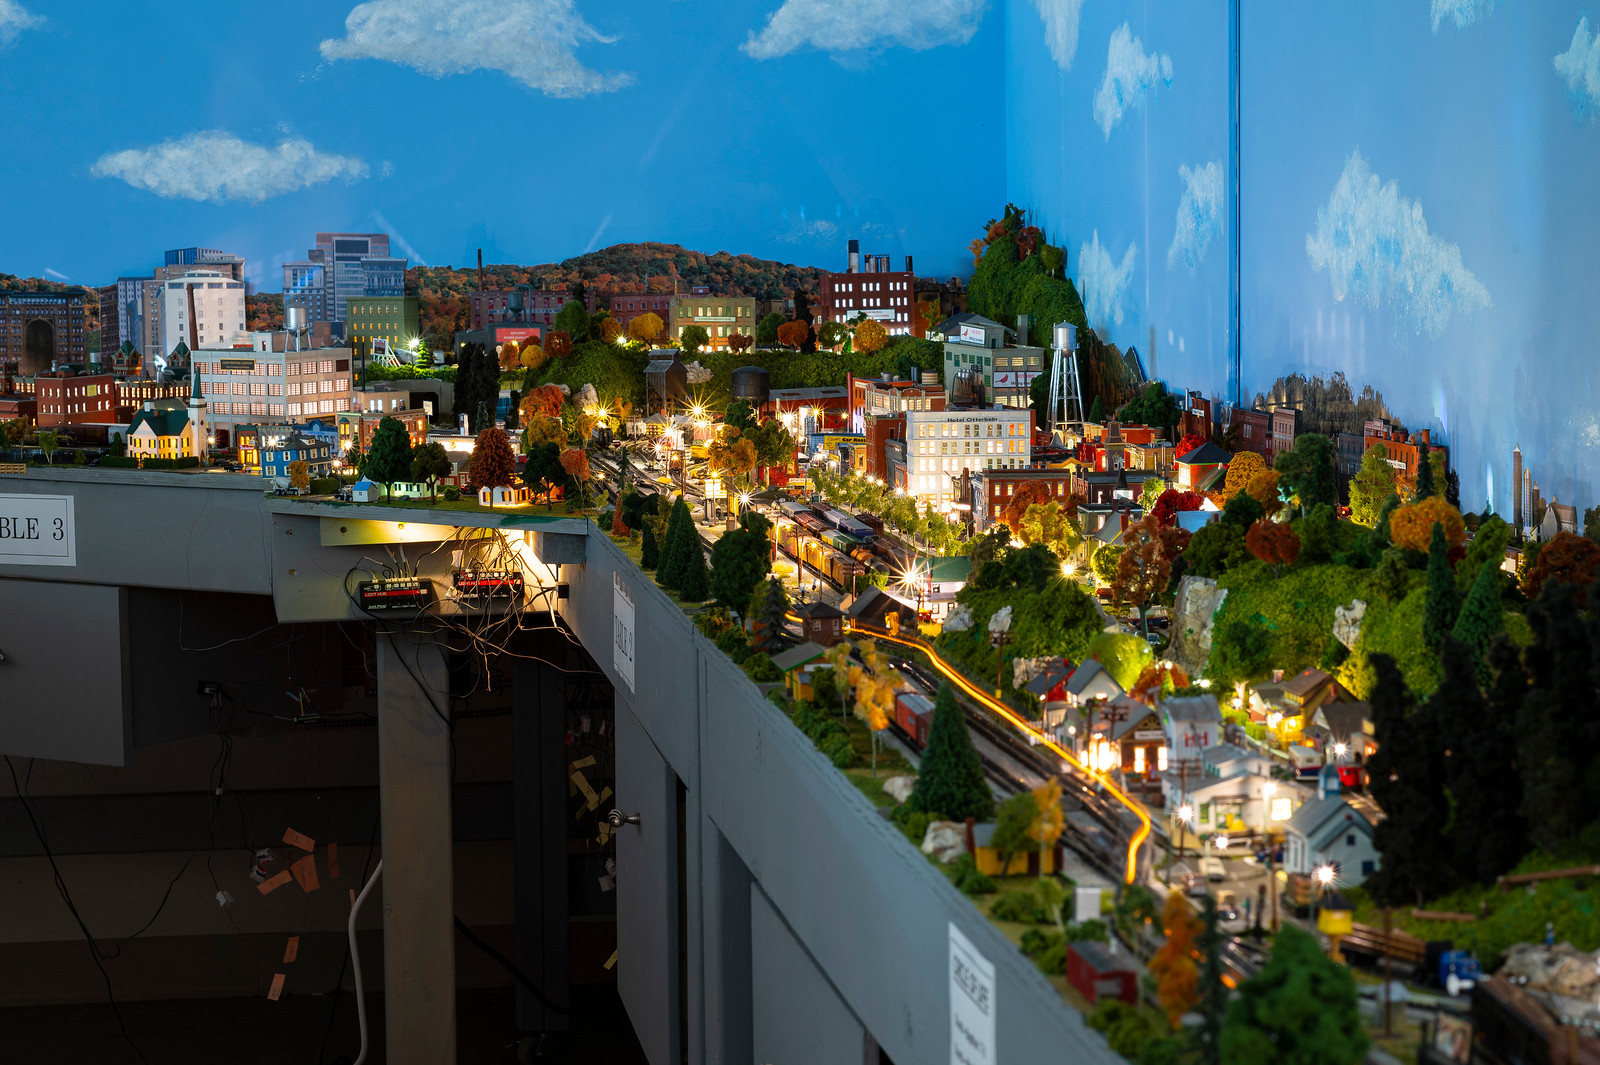 Otterbein Lebanon model trains lit up at night